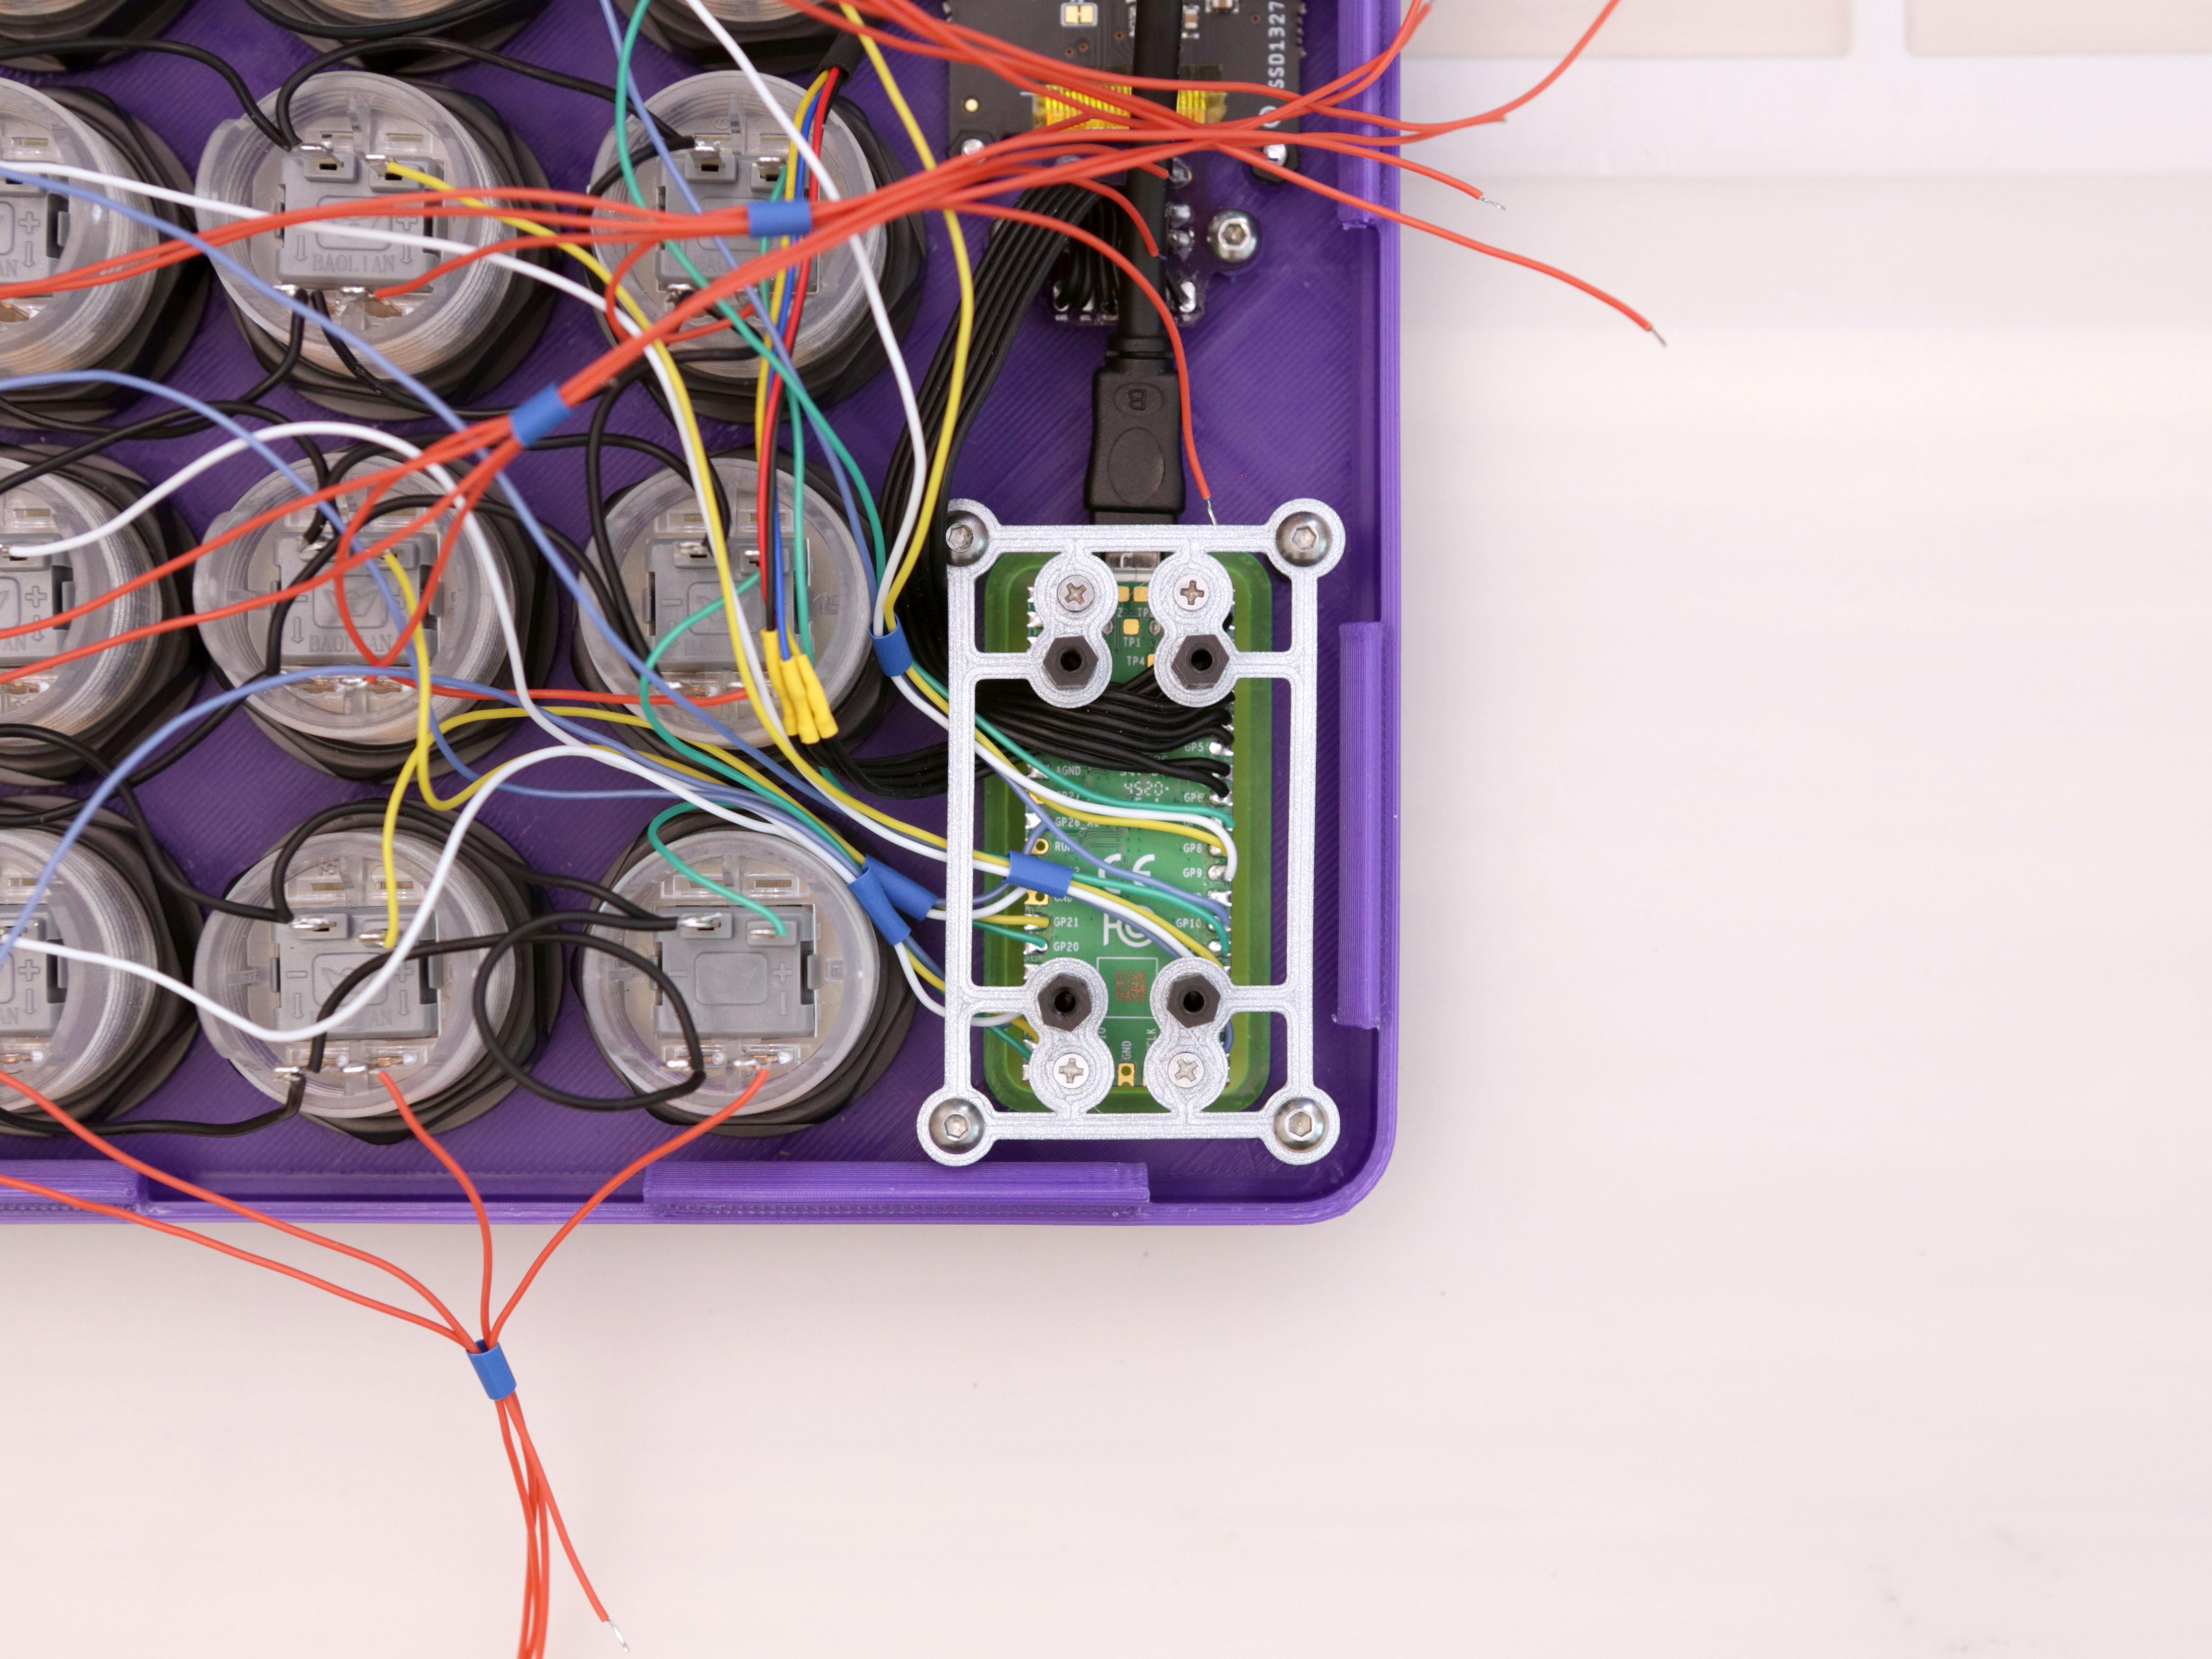 3d_printing_pcb-mount-top-secured-back.jpg